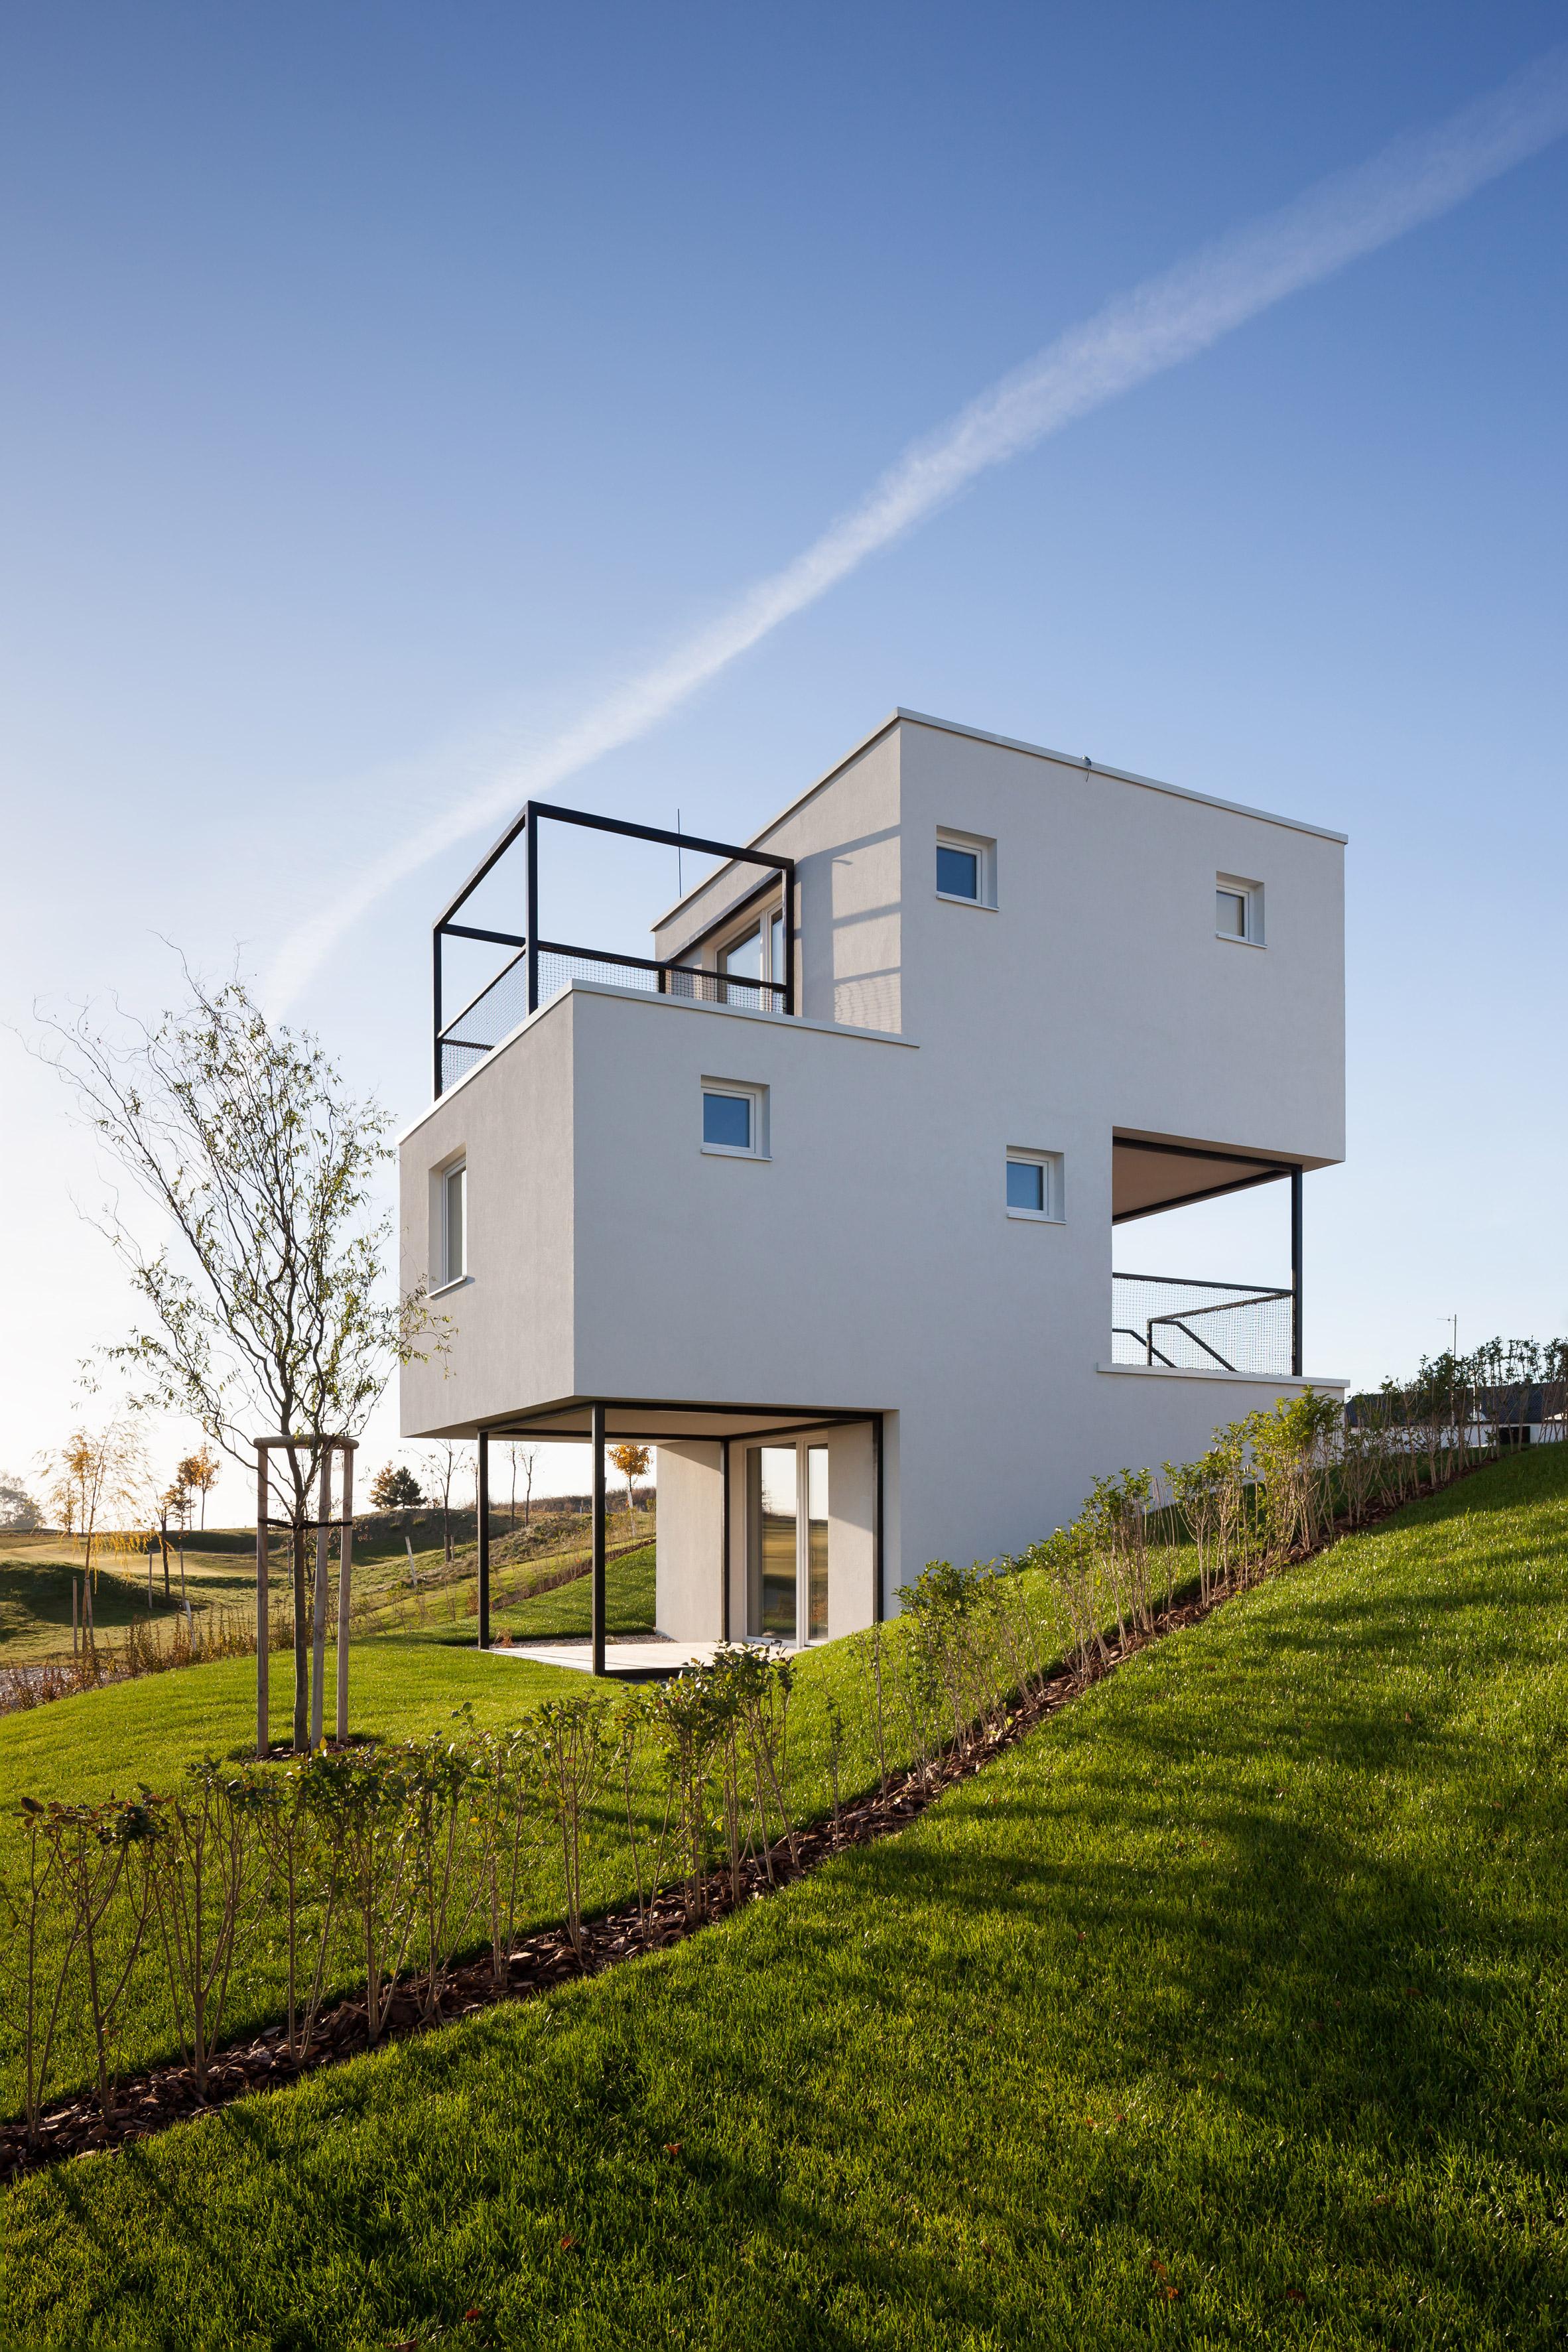 3x3 Houses by Endorfine